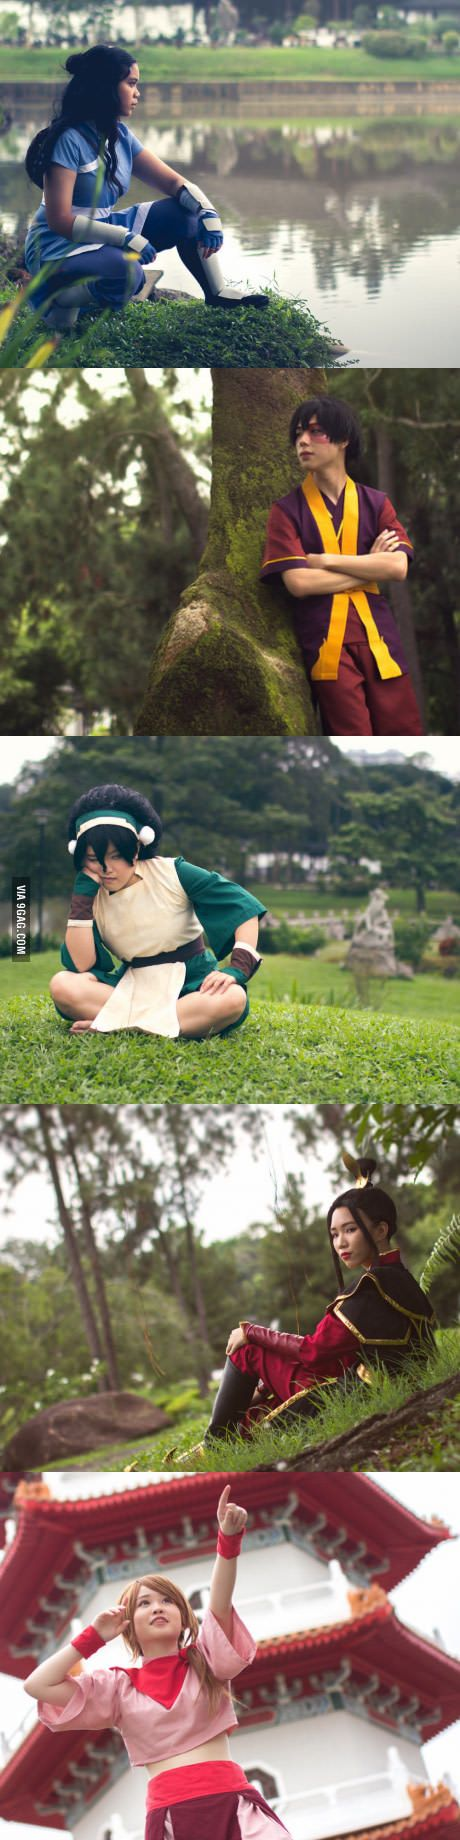 Avatar: The Last Airbender cosplays!